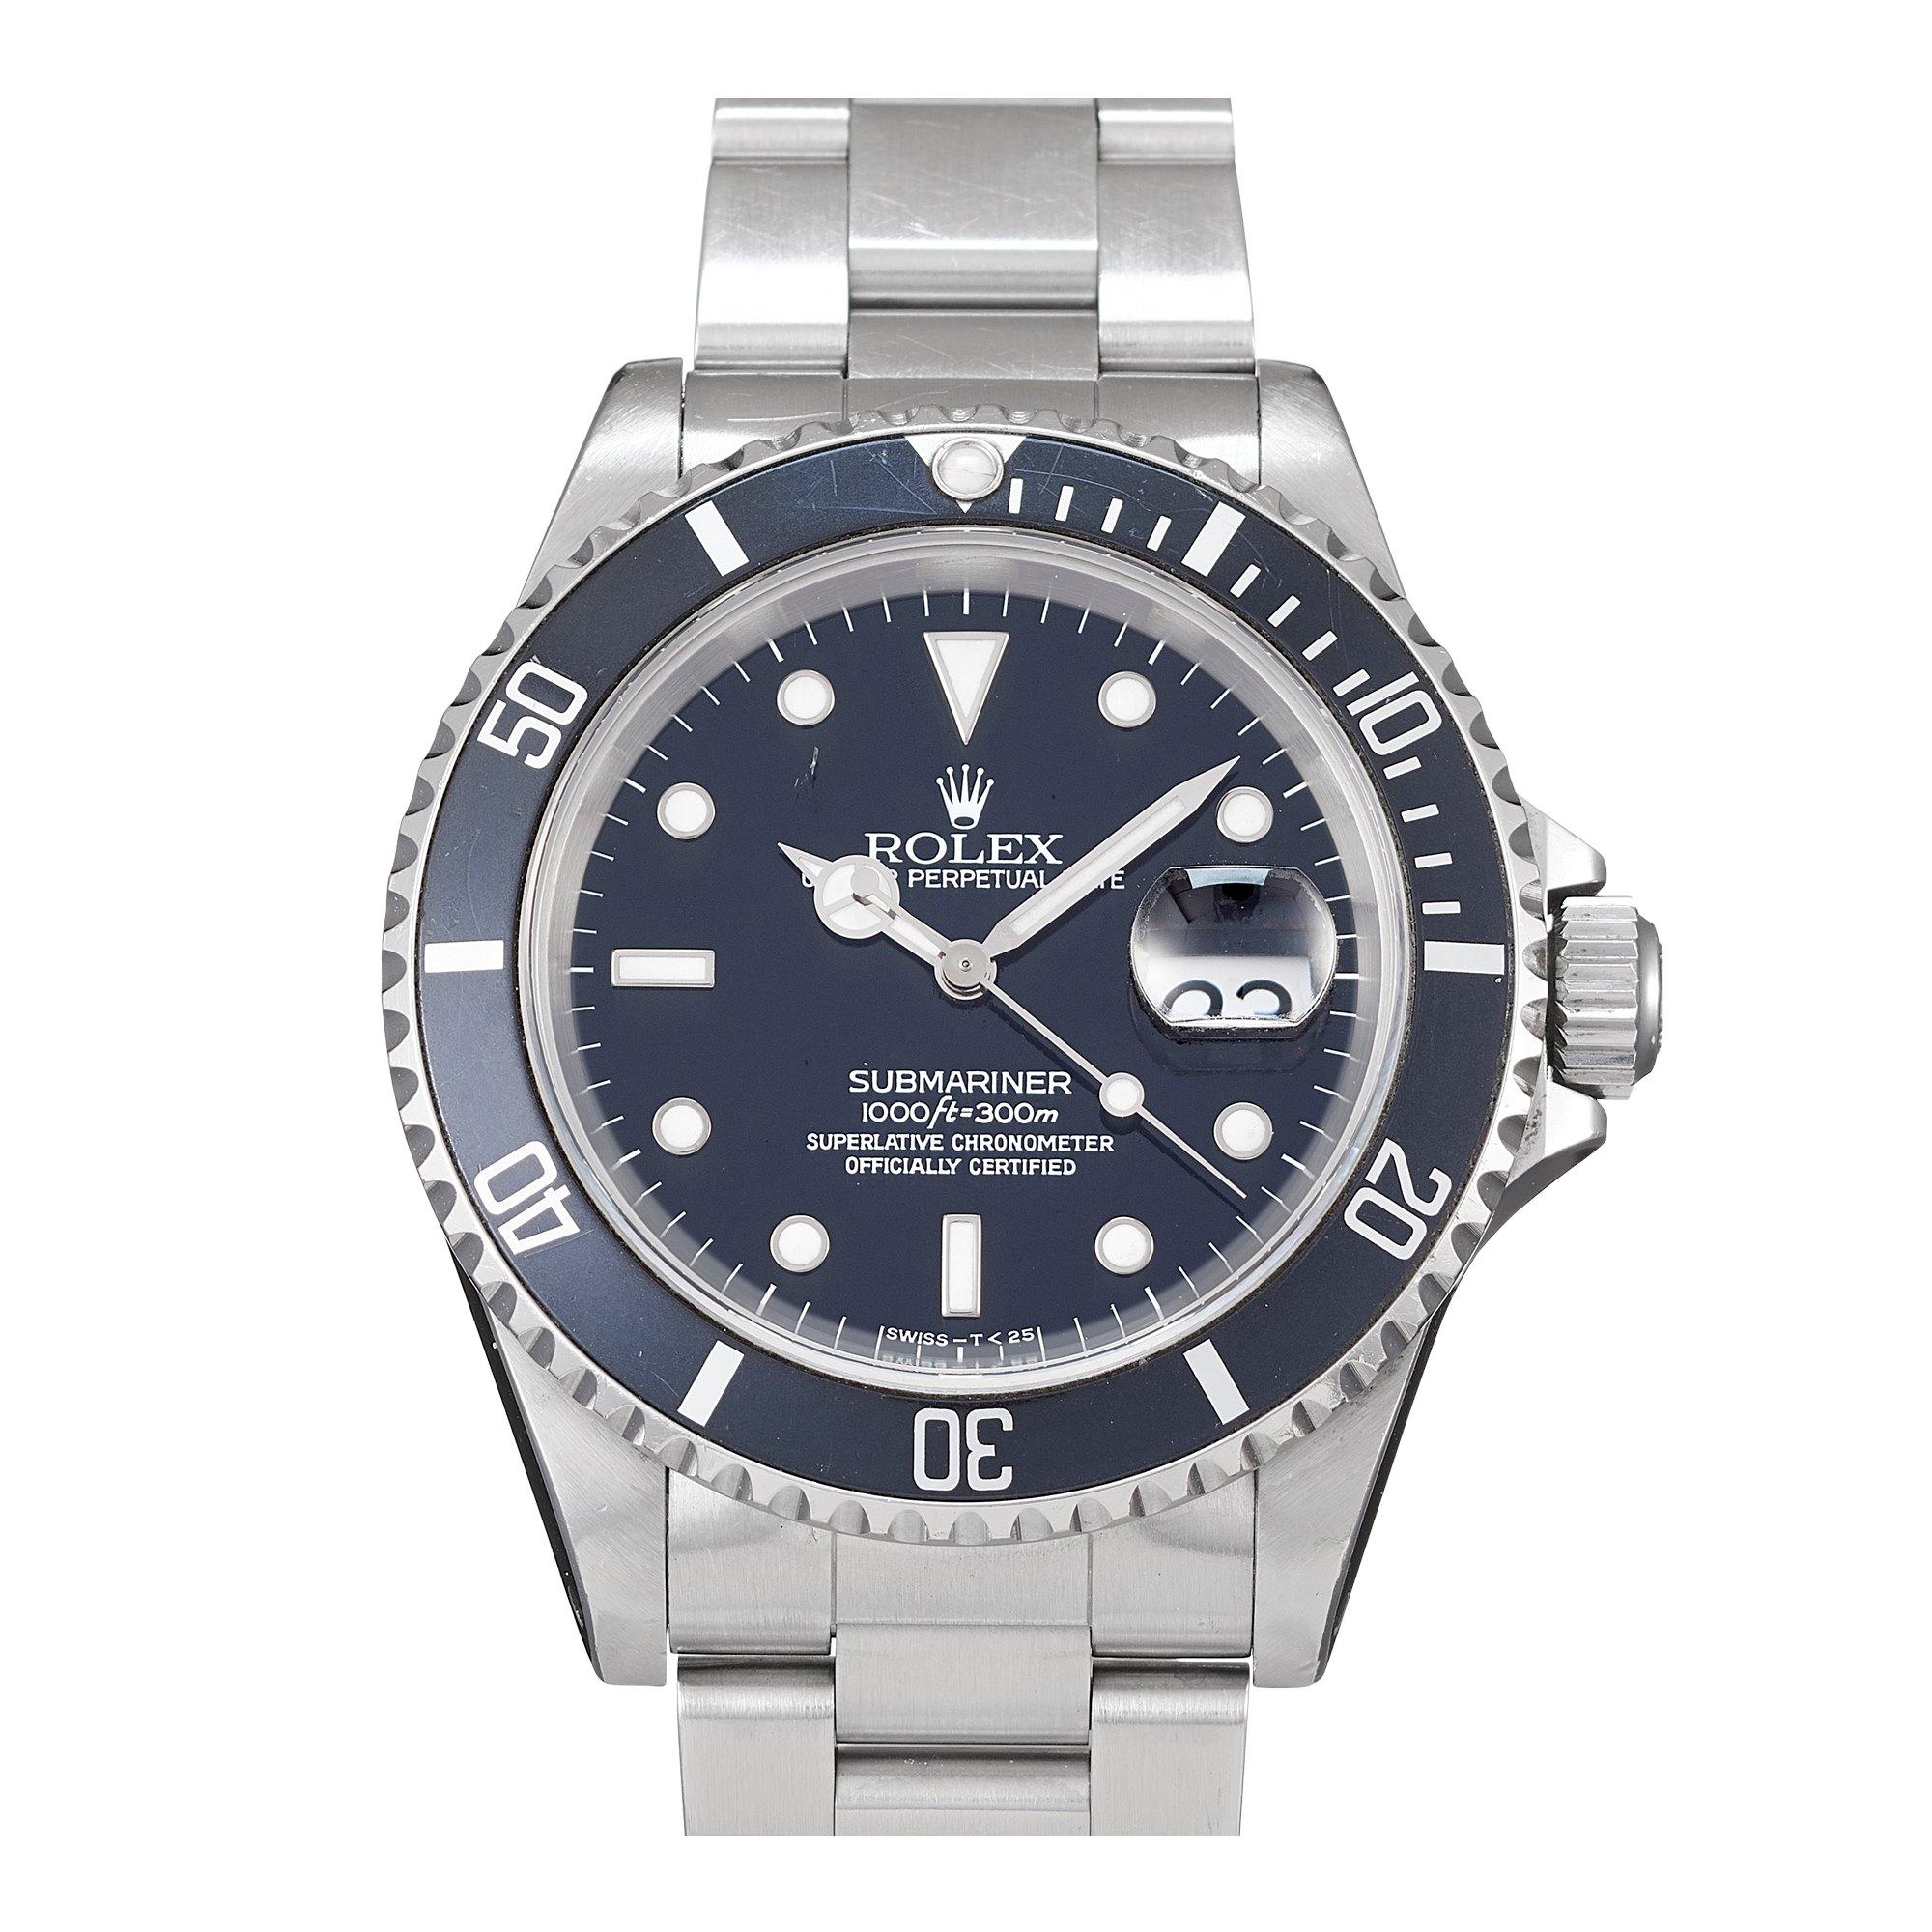 Rolex Submariner Date Stainless Steel 16610